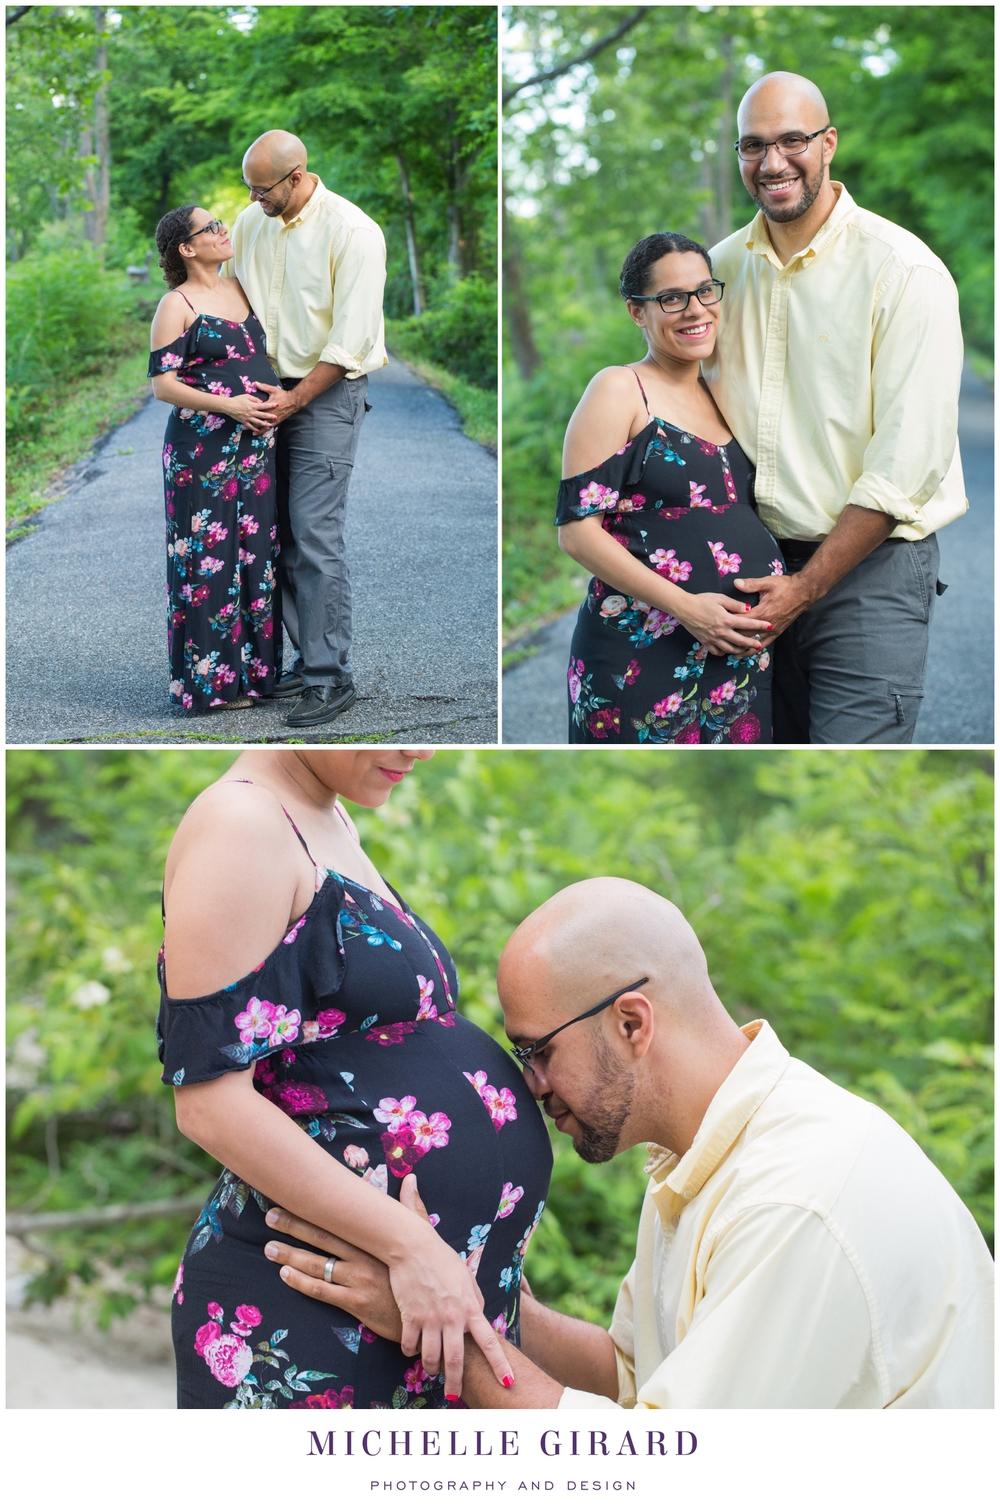 MaternitySession_BabyBump_MichelleGirardPhotography04.jpg